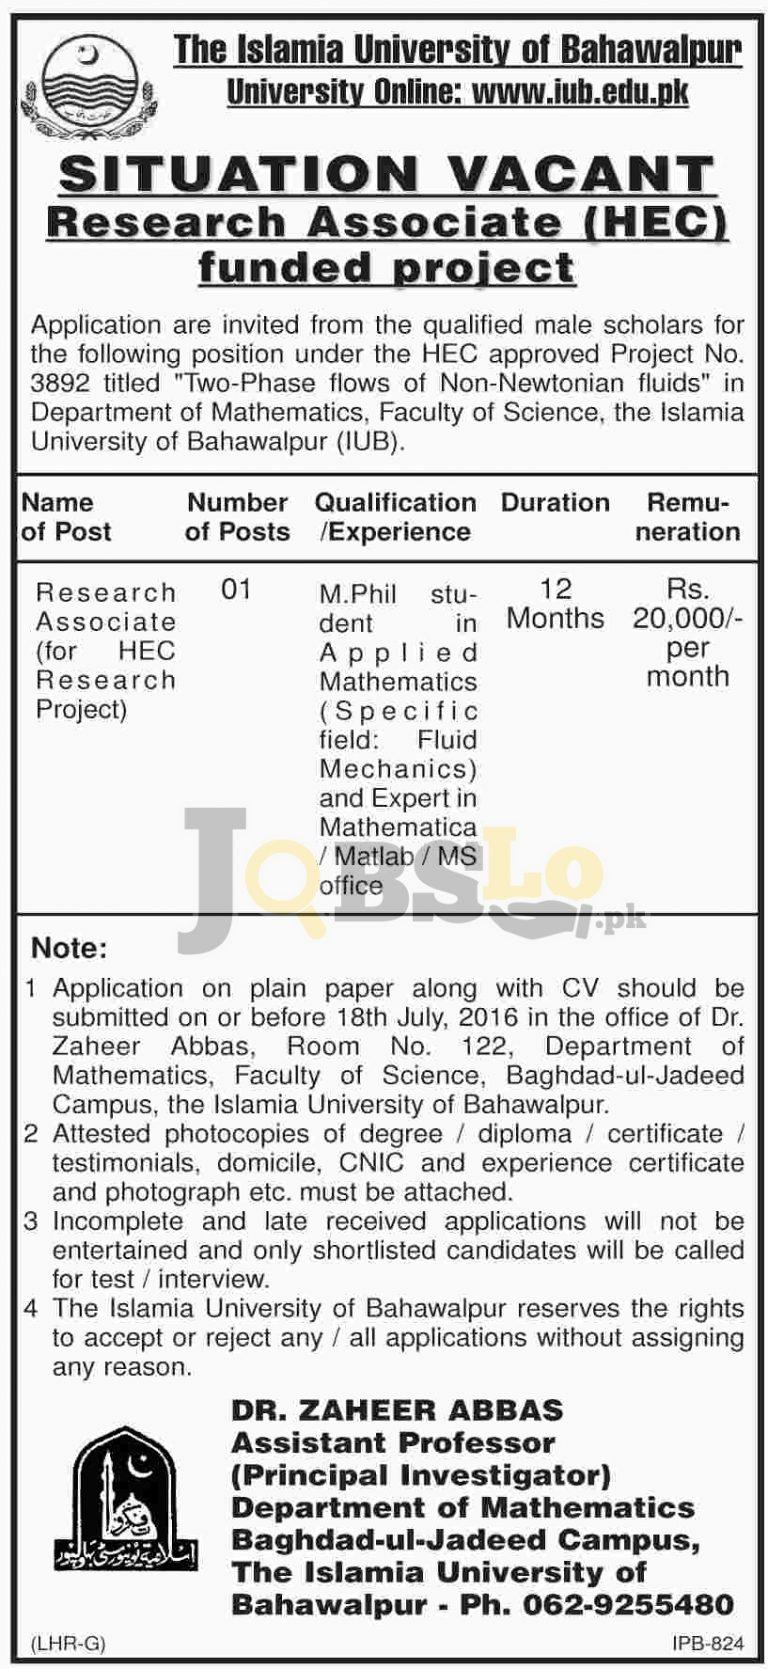 Islamia University of Bahawalpur Jobs 2016 For Research Associate Eligibility Criteria